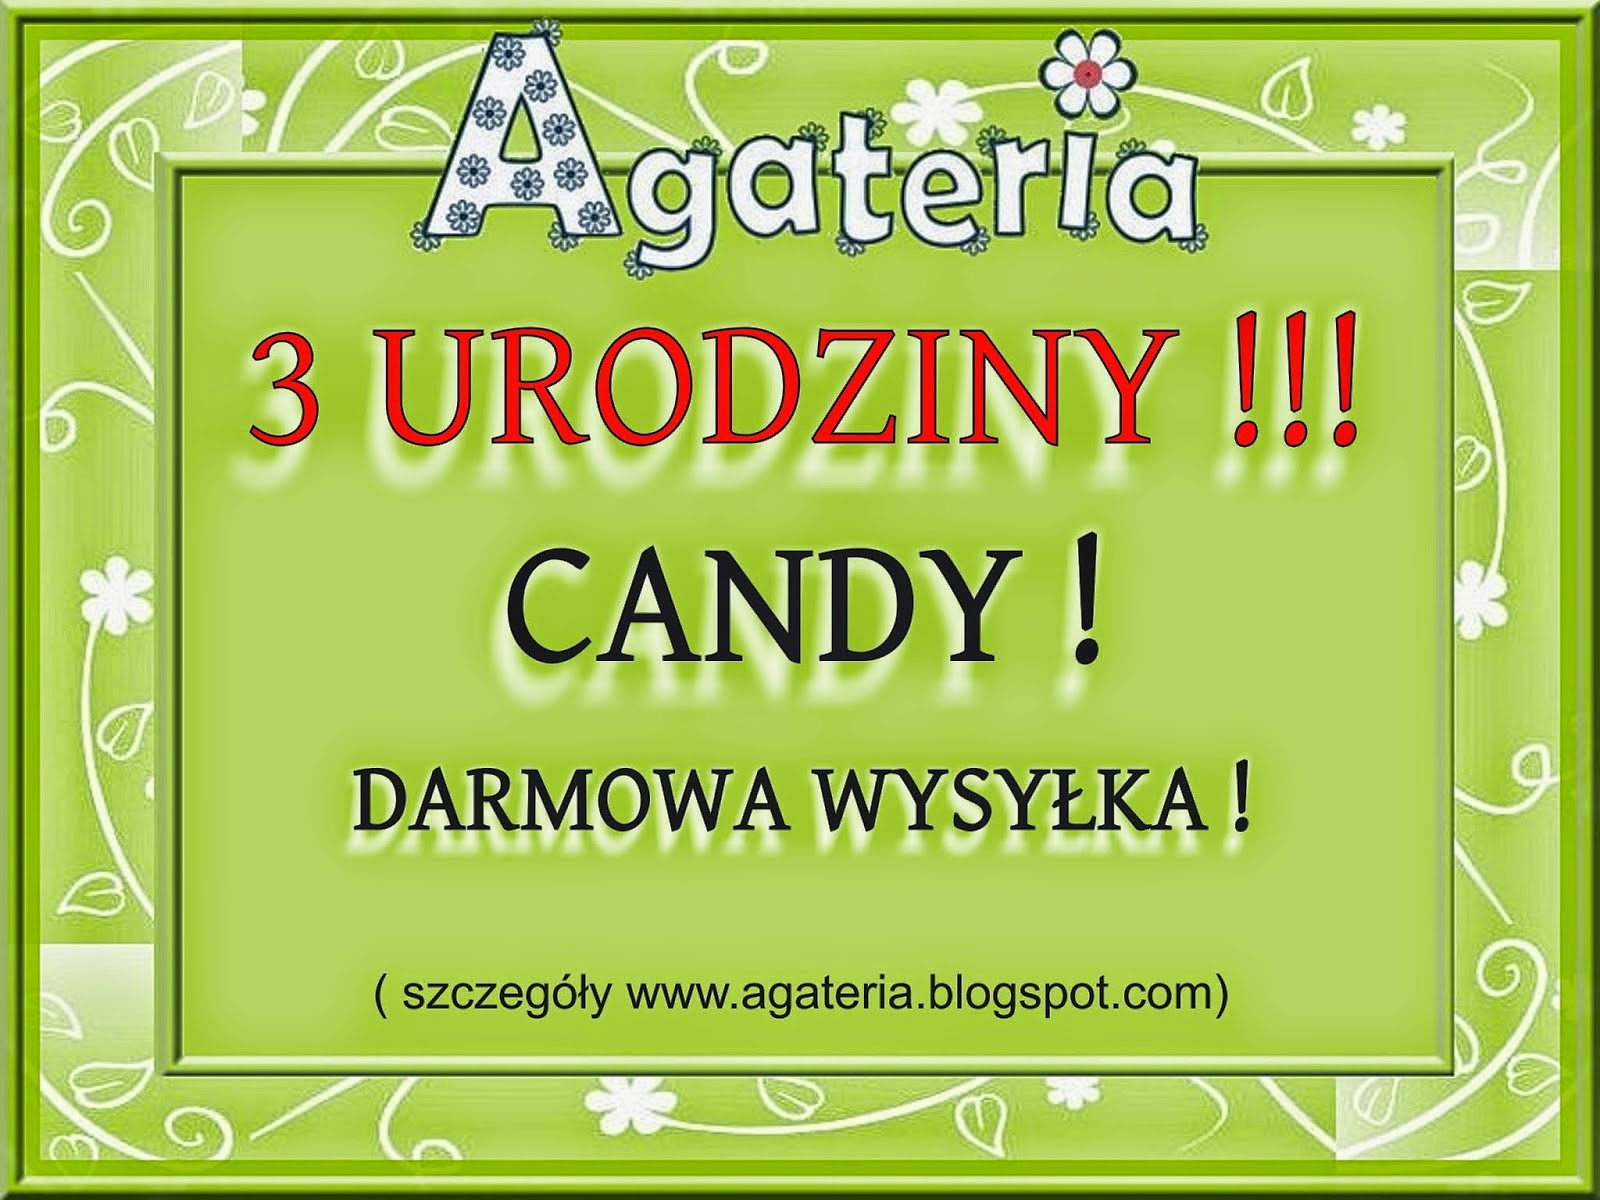 http://agateria.blogspot.com/2014/08/3-urodziny-agaterii.html